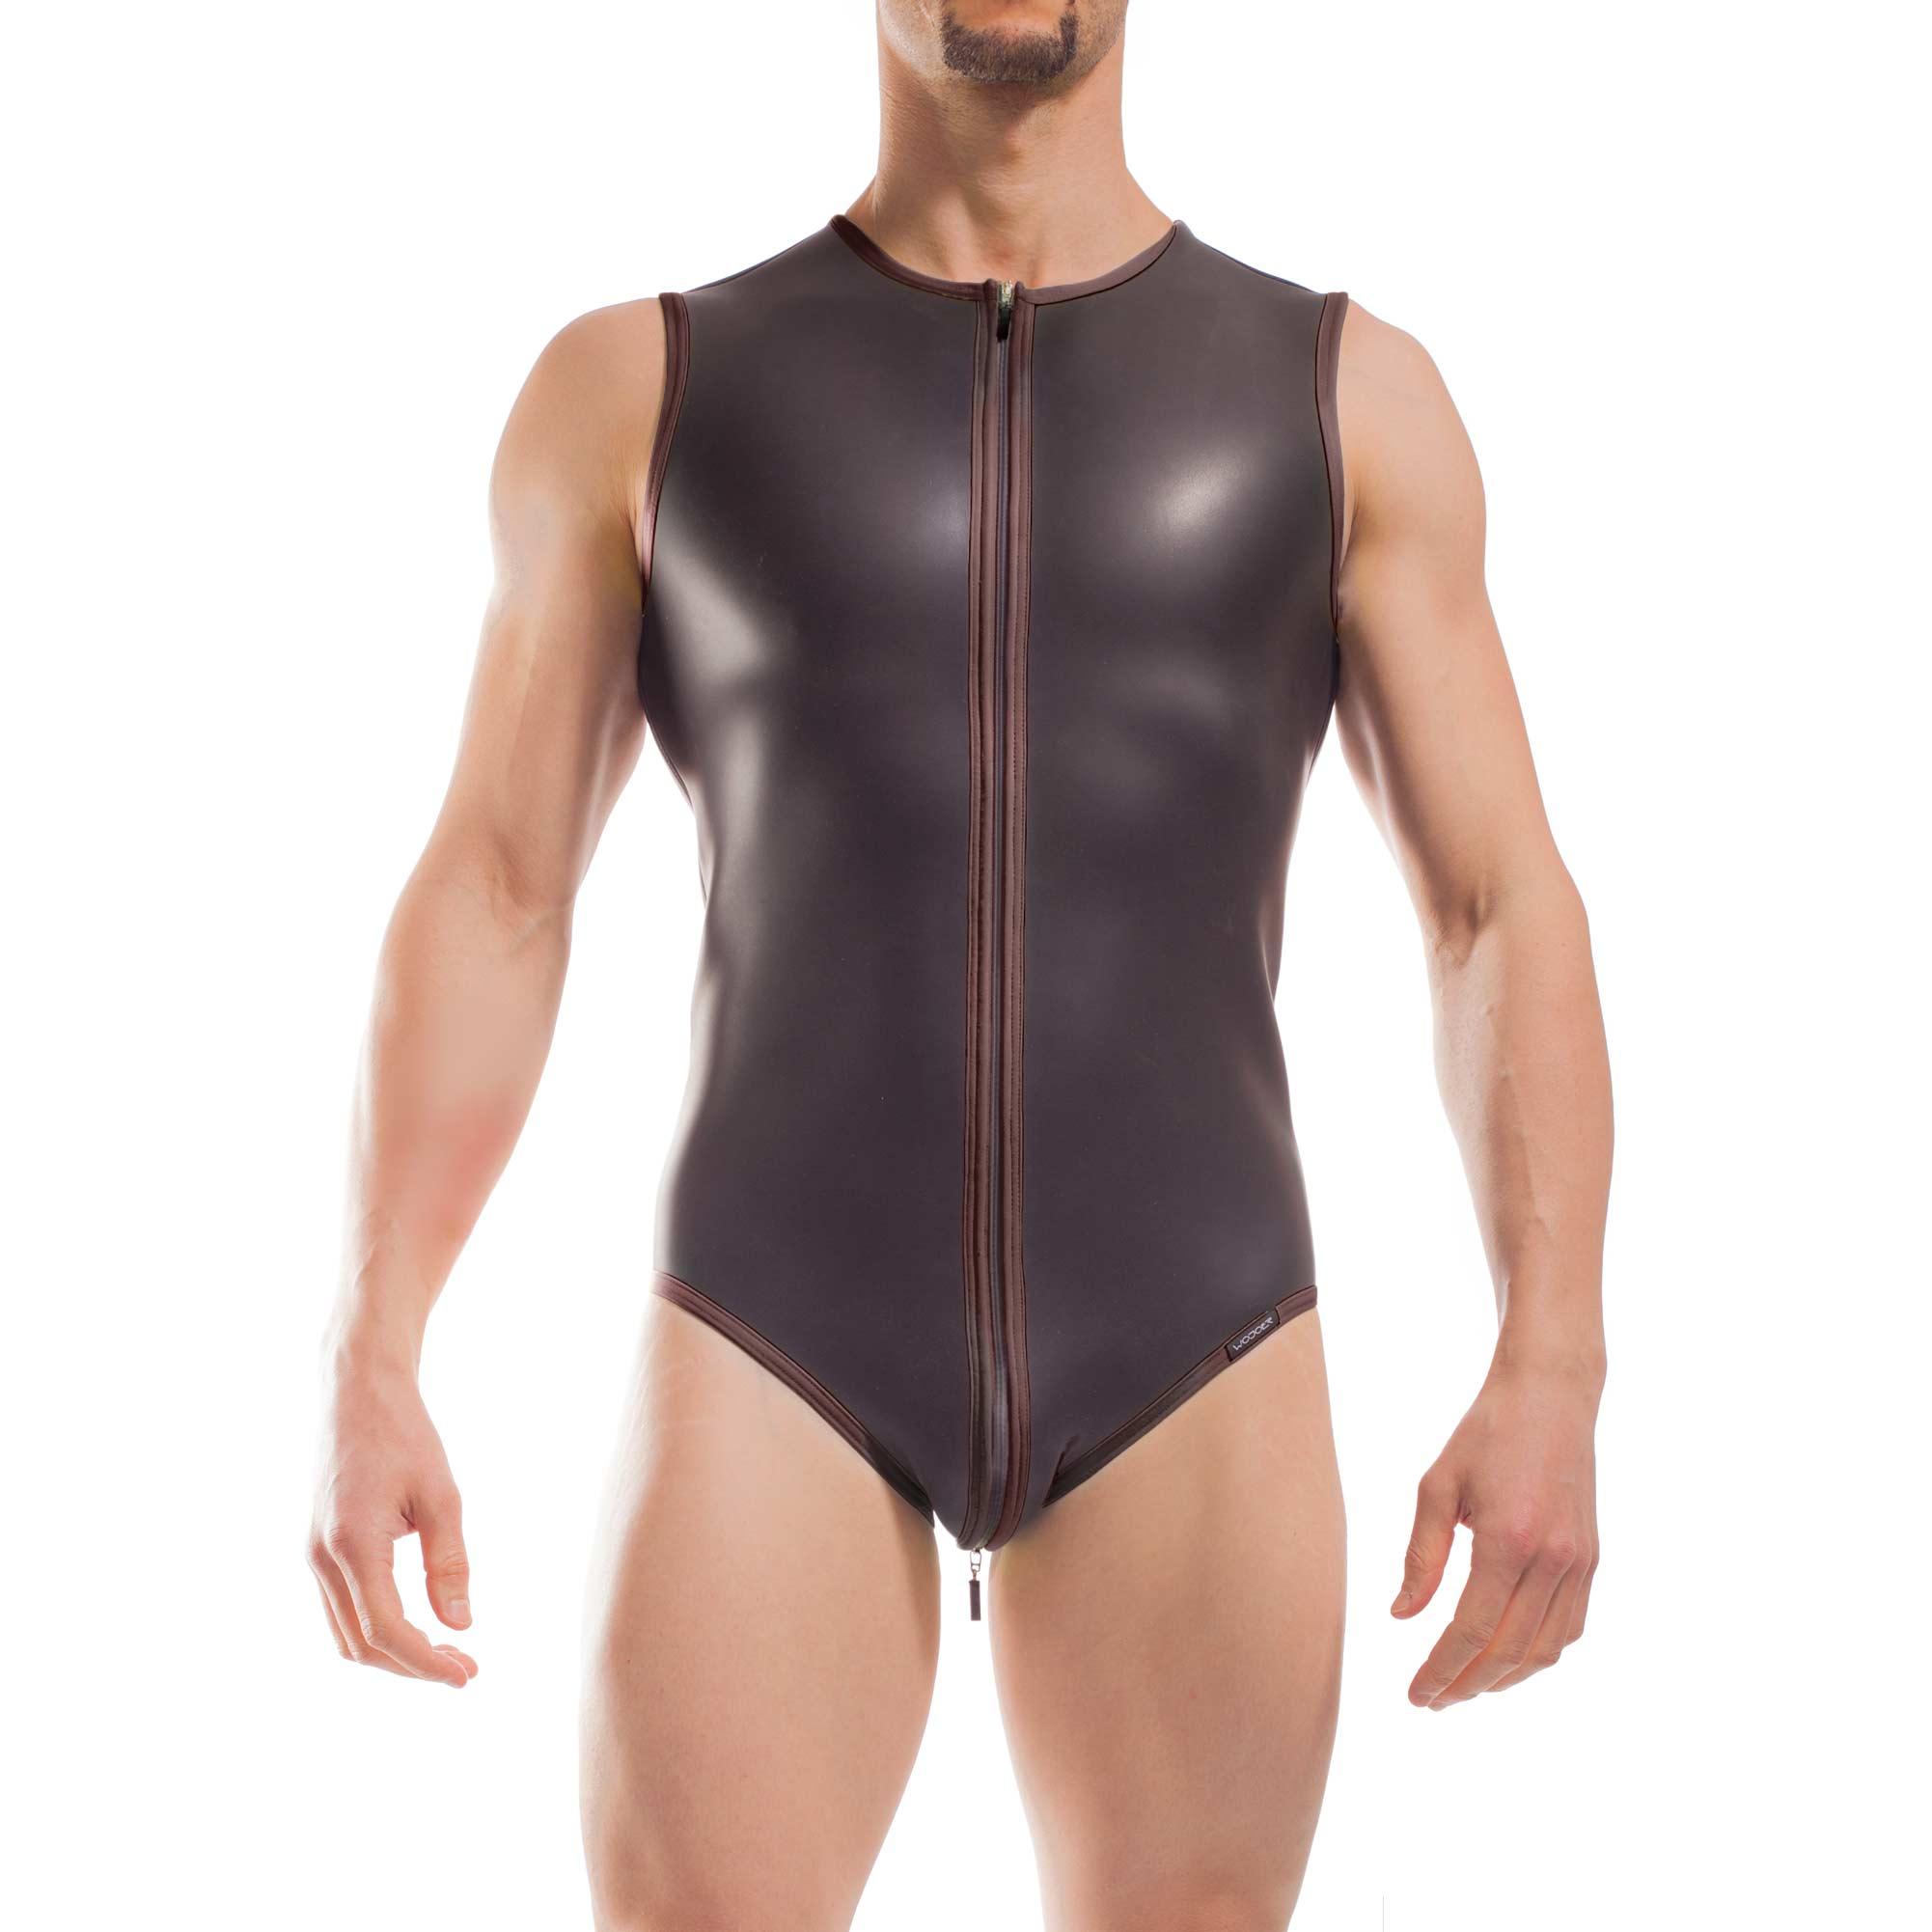 Wojoer Neopren Body, Slip Body, Glatthautneopren, Männer Ganzkörpernazug, Shorty, Herren Badeanzug, braun